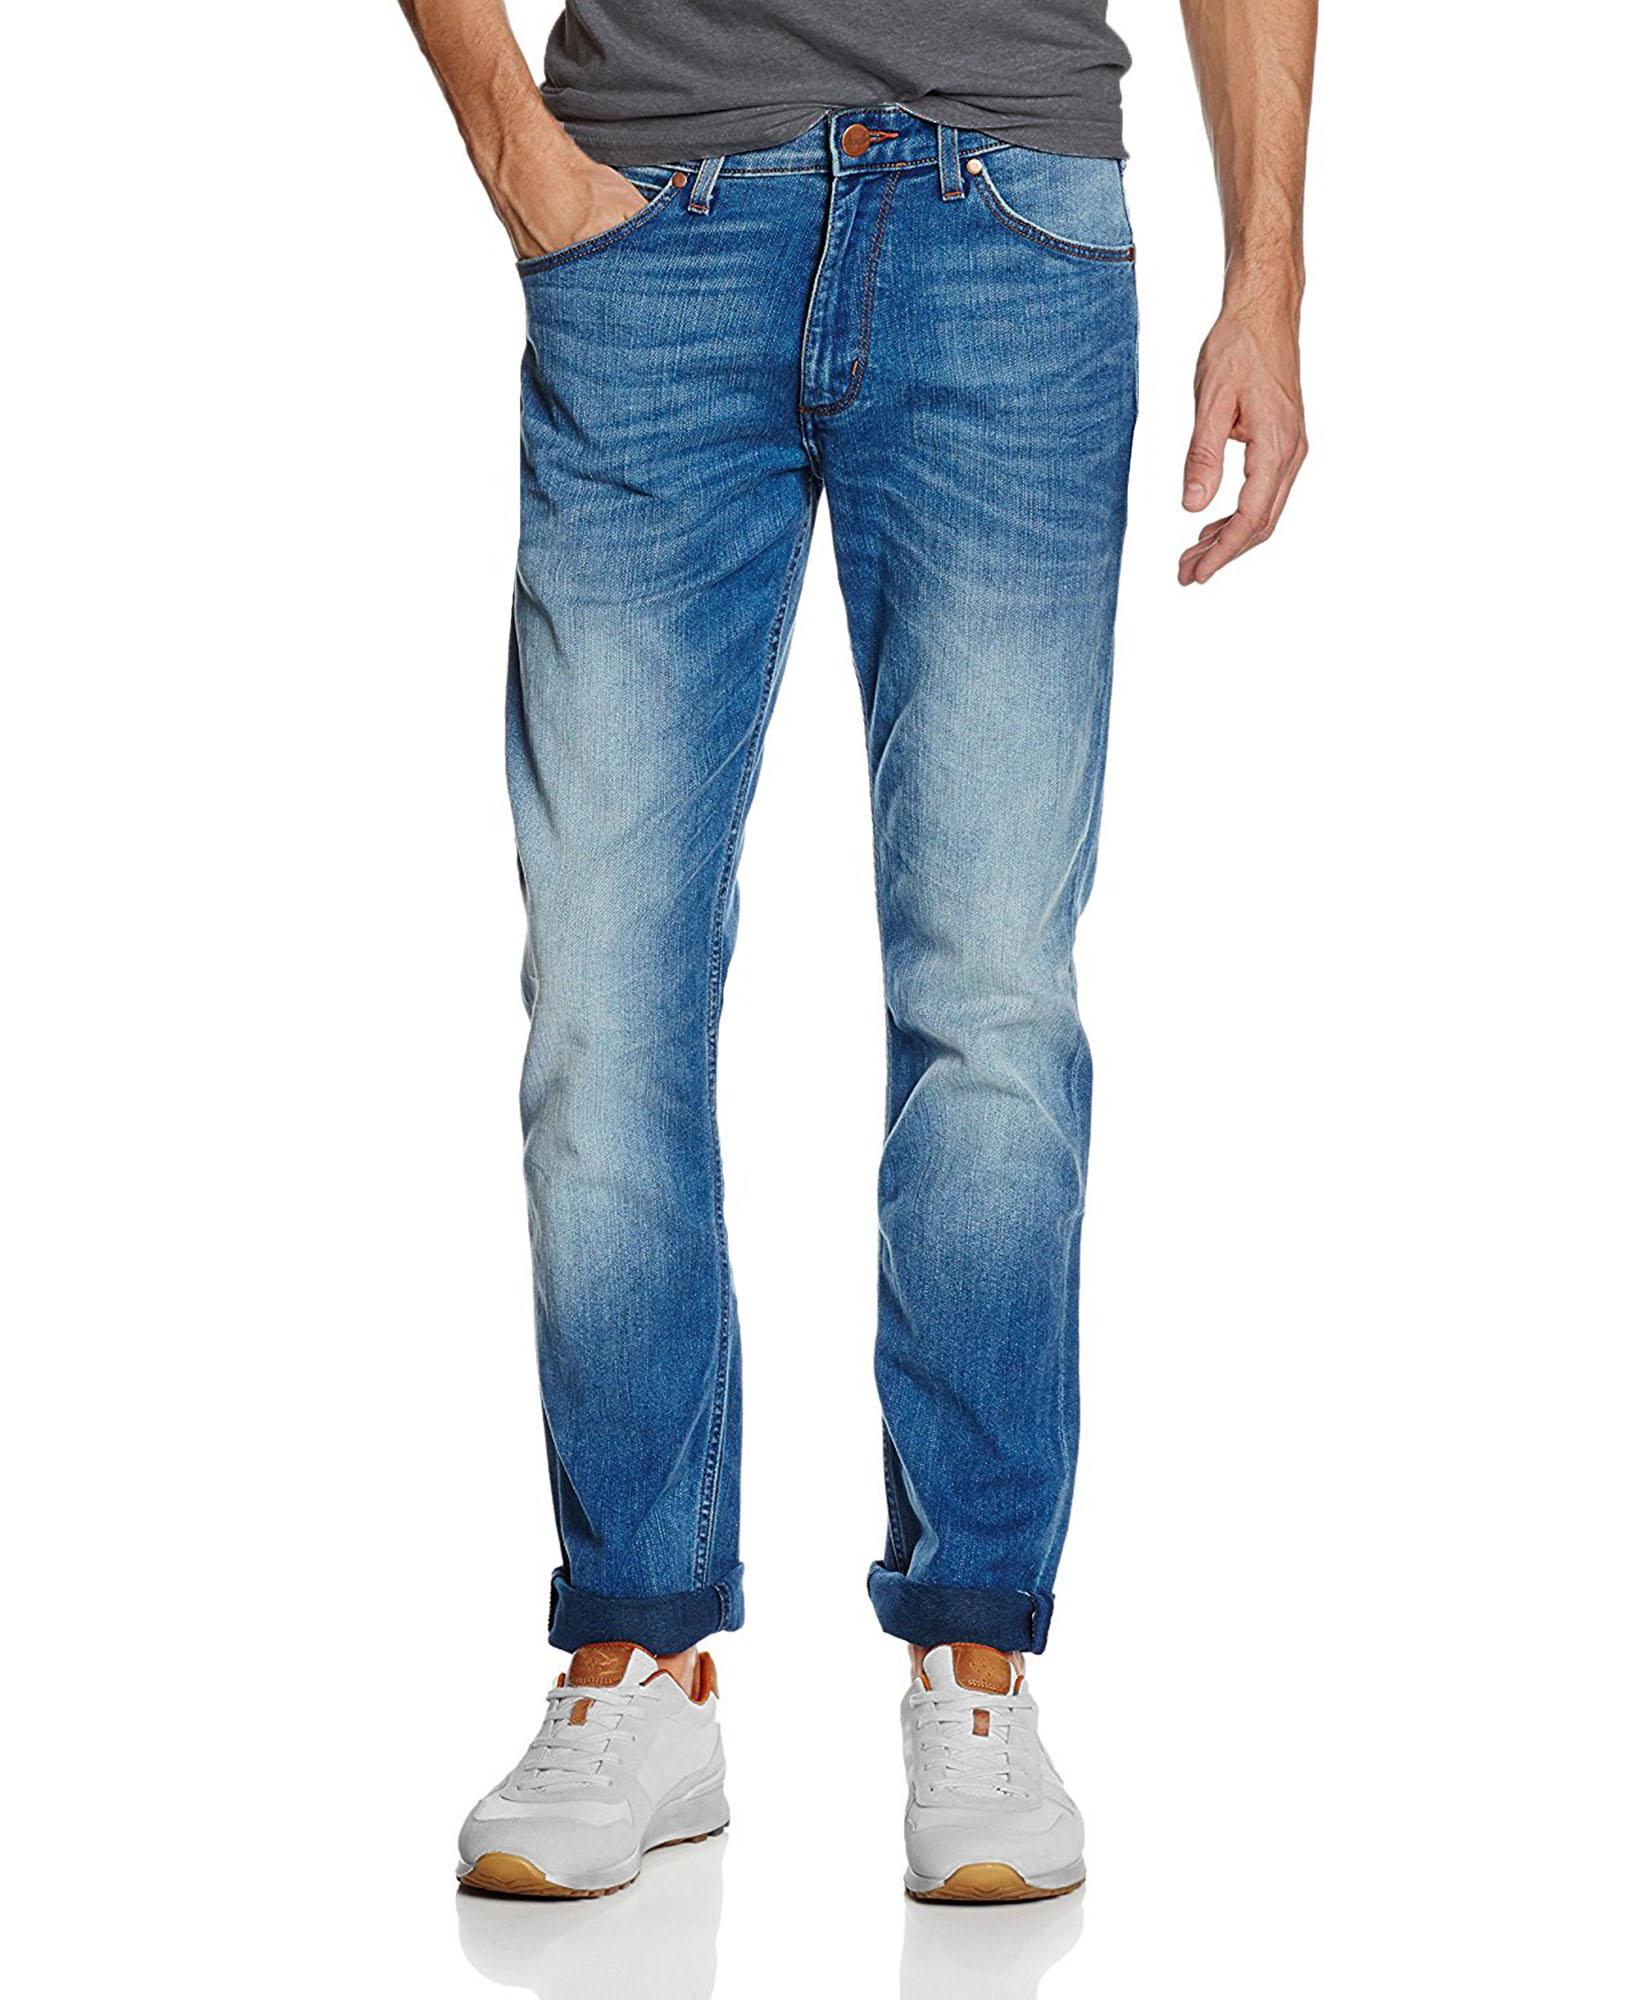 wrangler greensboro regular straight tapered stretch jeans blown away denim ebay. Black Bedroom Furniture Sets. Home Design Ideas